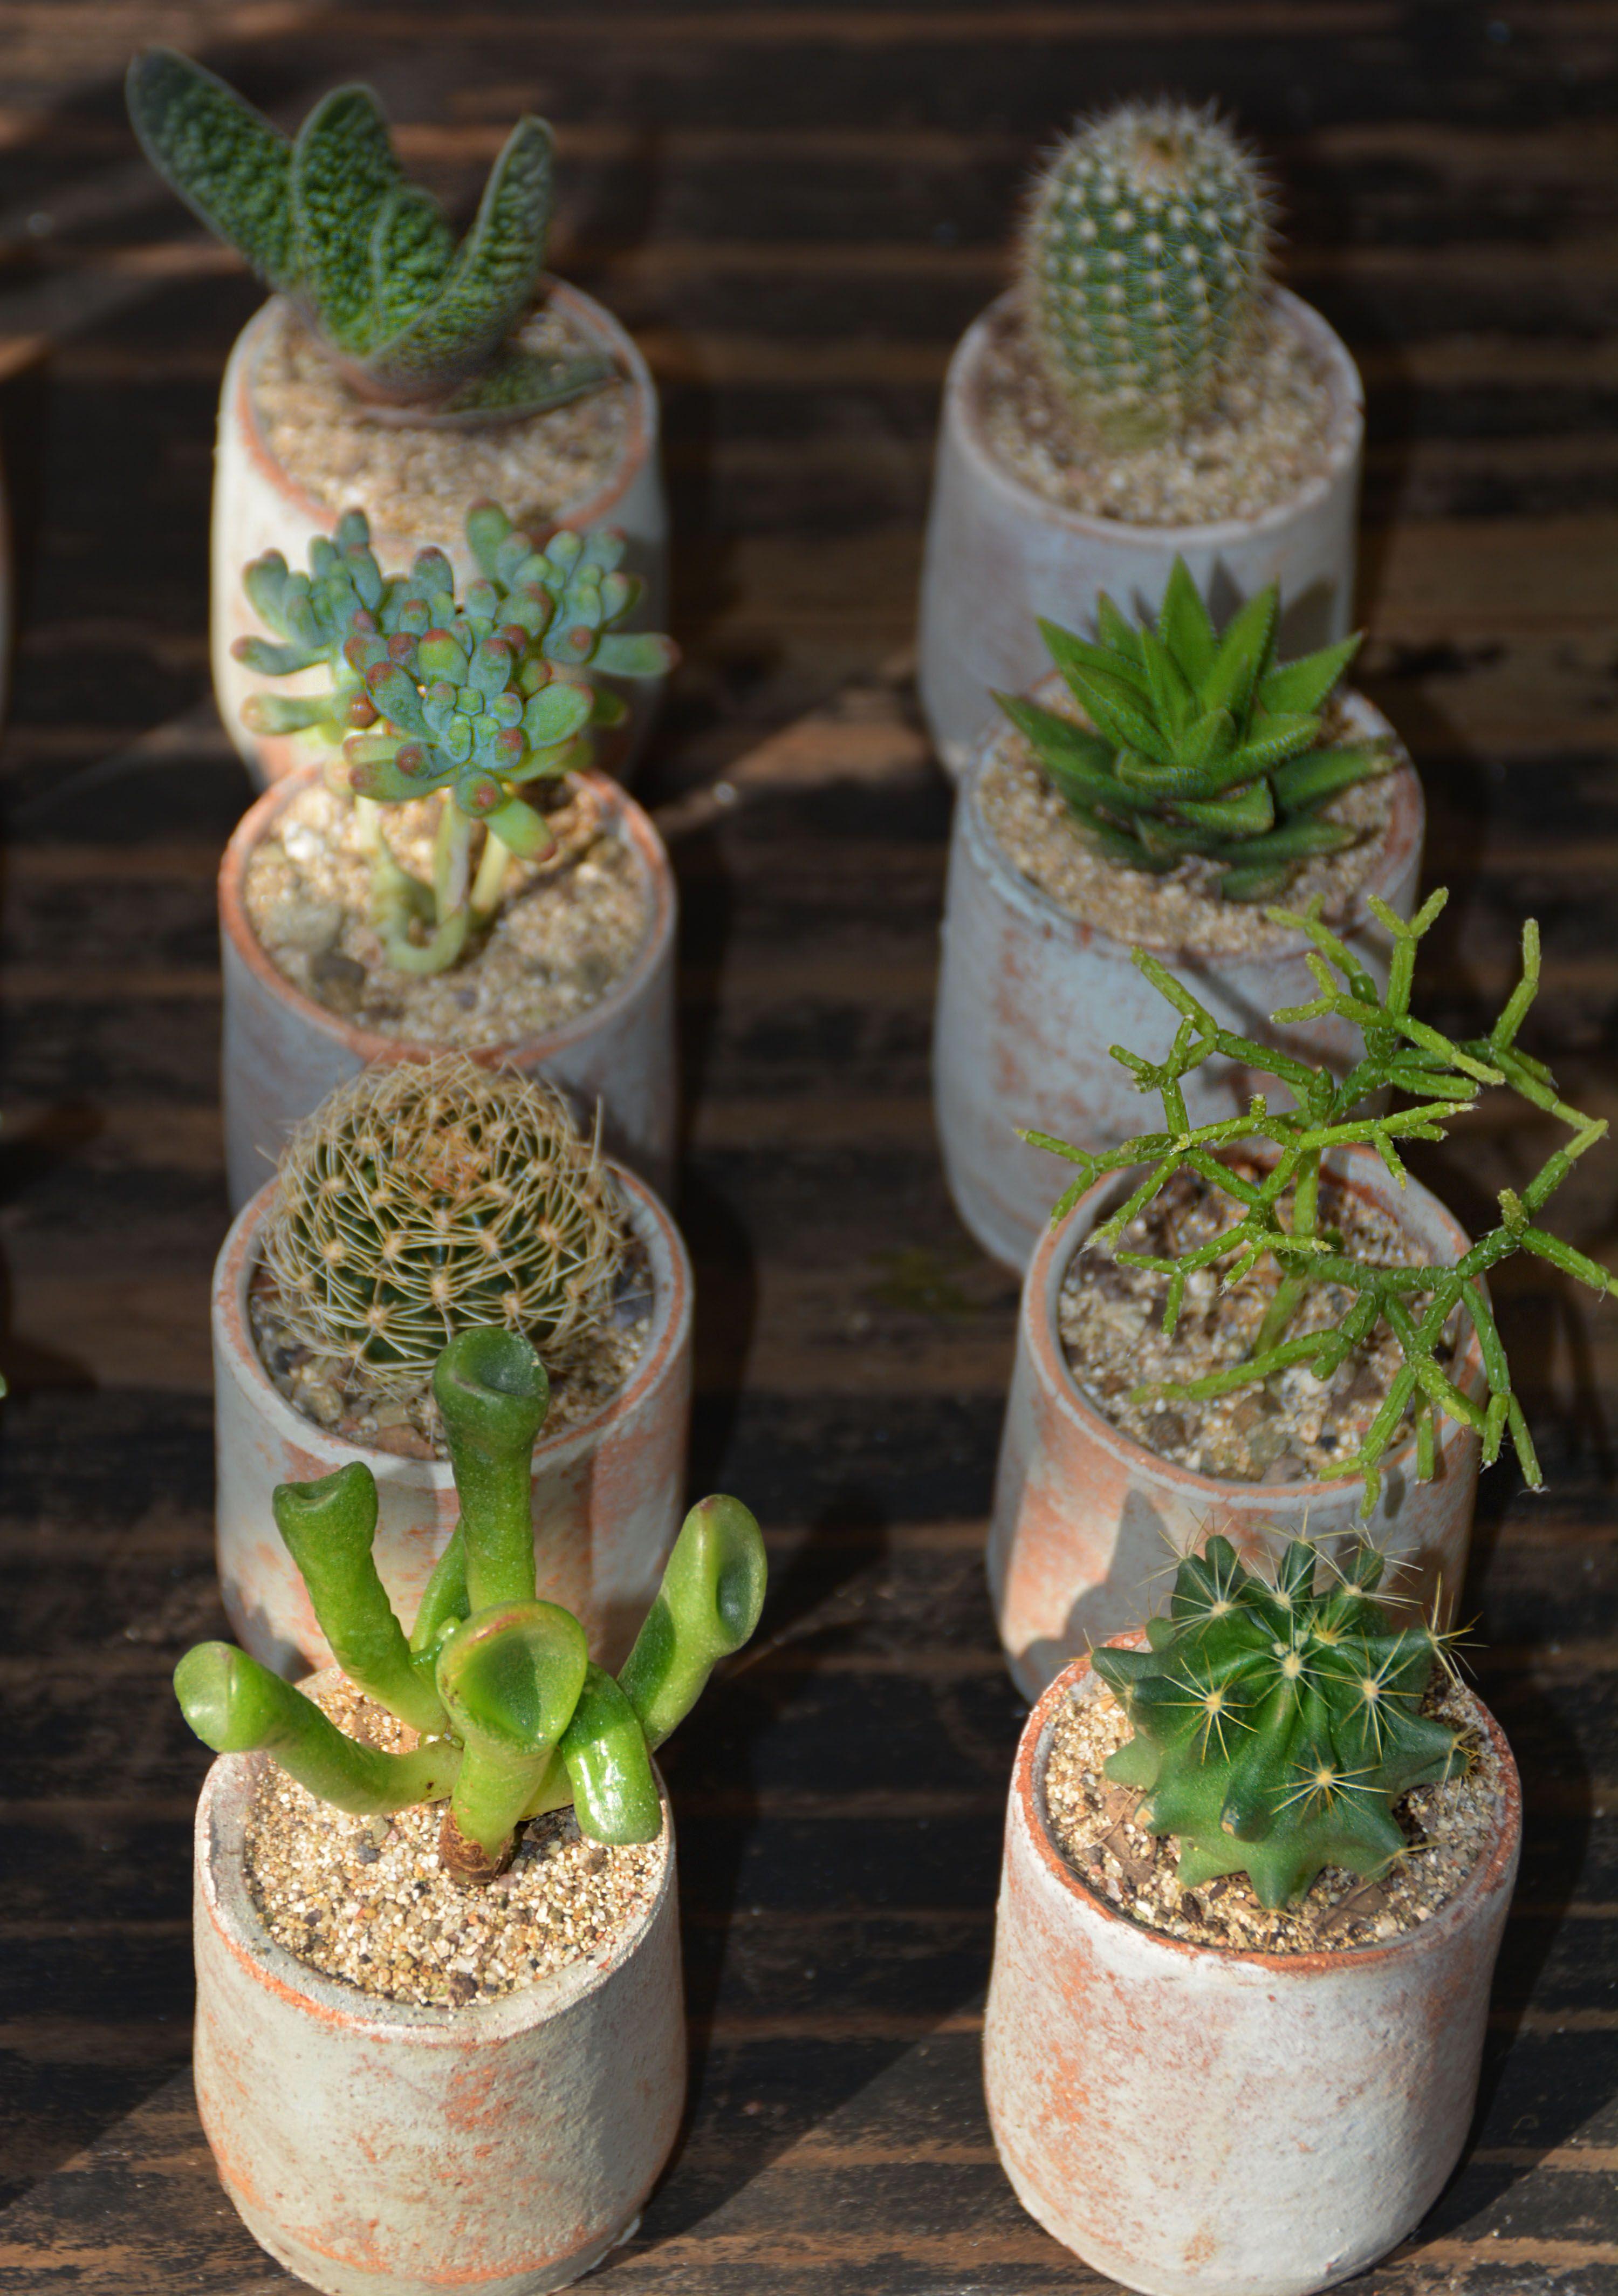 Cactus Suculenta Green Nature Garden Rustic With Images